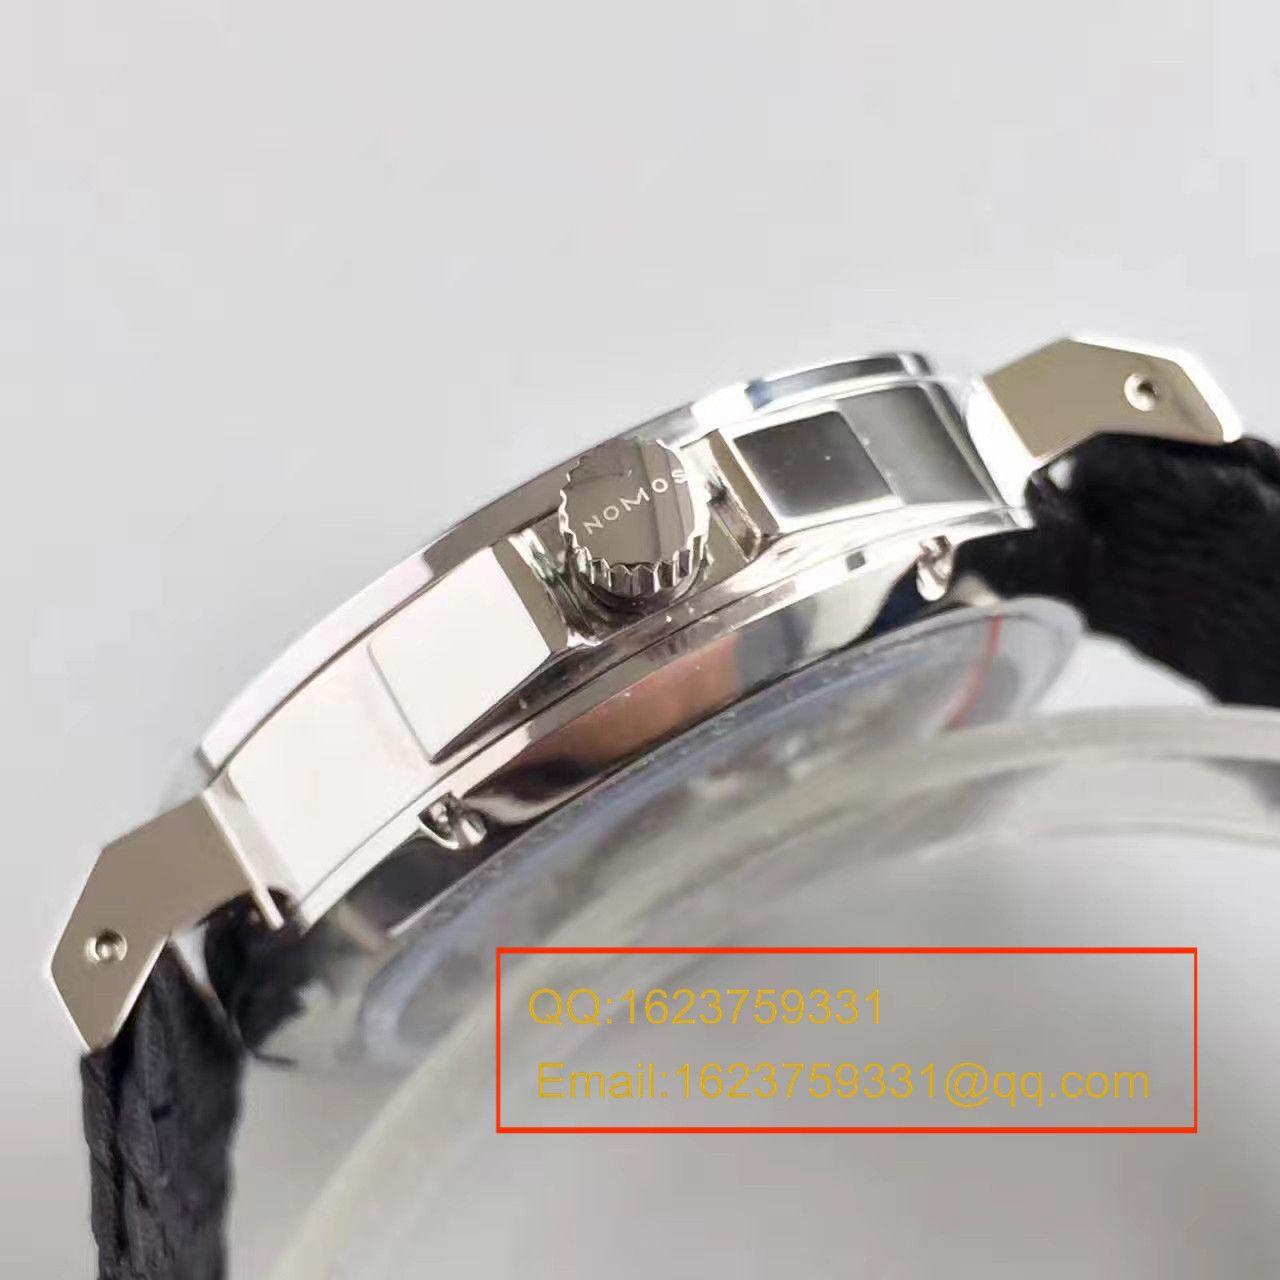 【OS厂一比一顶级复刻手表】NOMOS(诺莫斯)Ahoi系列 550/551/552/553首款潜水表搭配尼龙带腕表